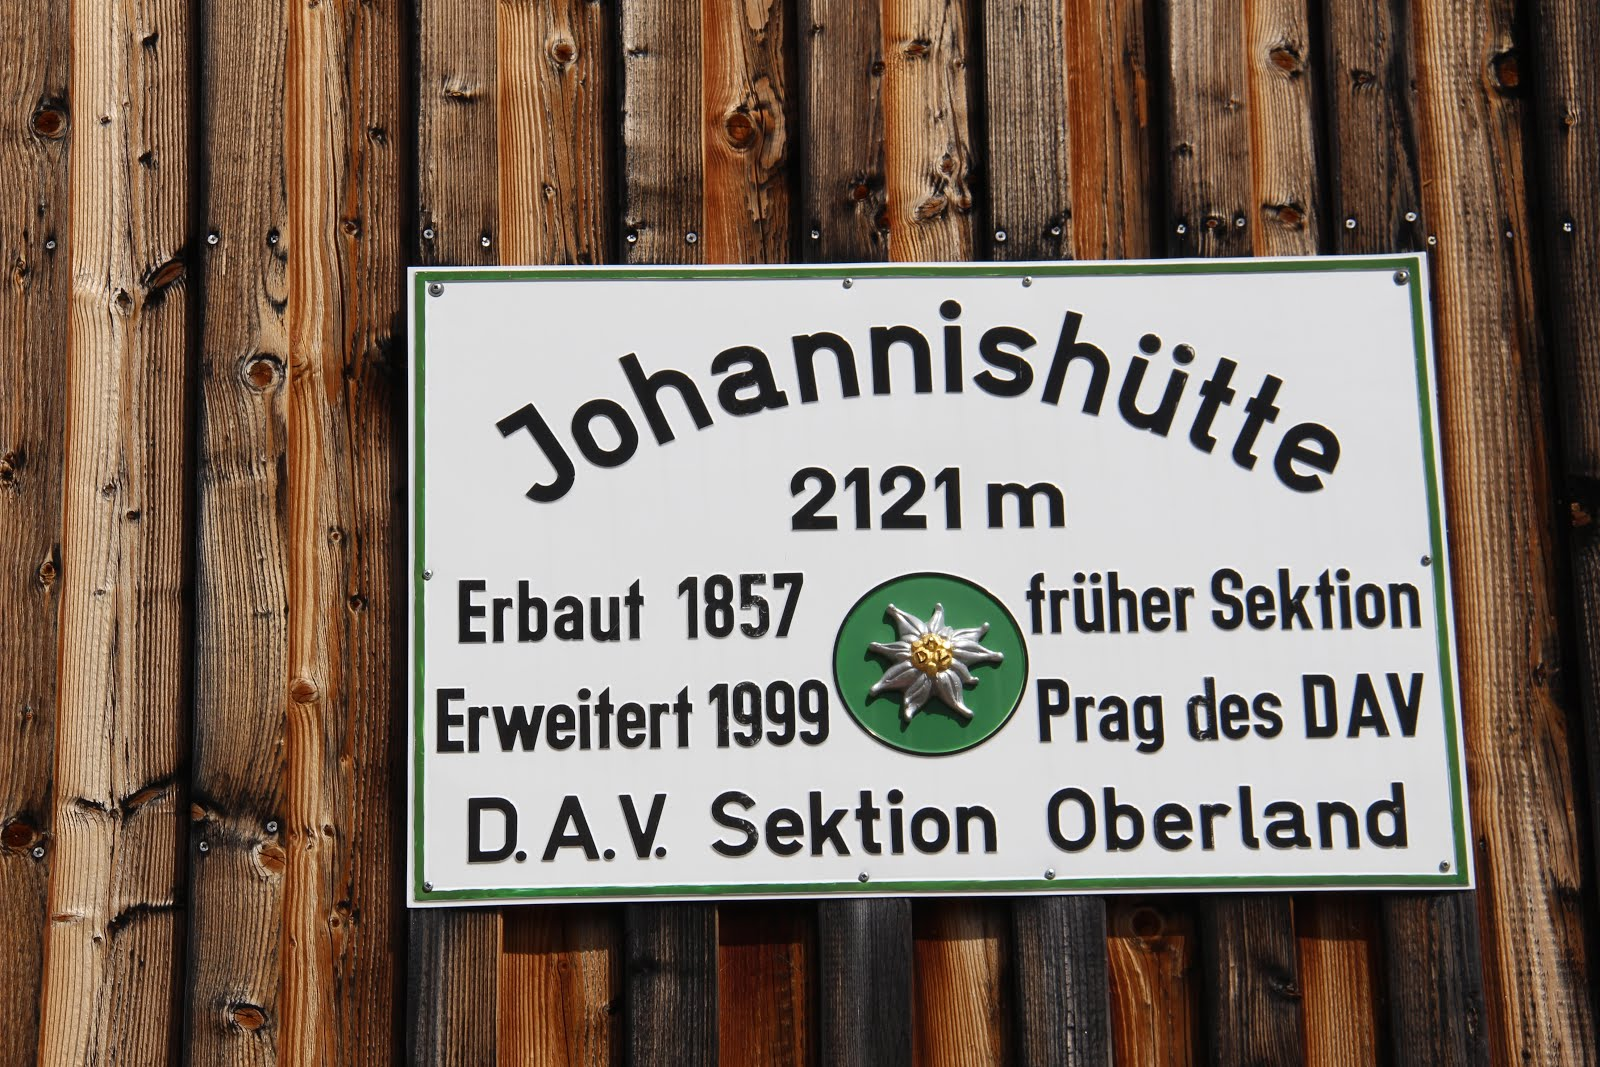 Johannishutte